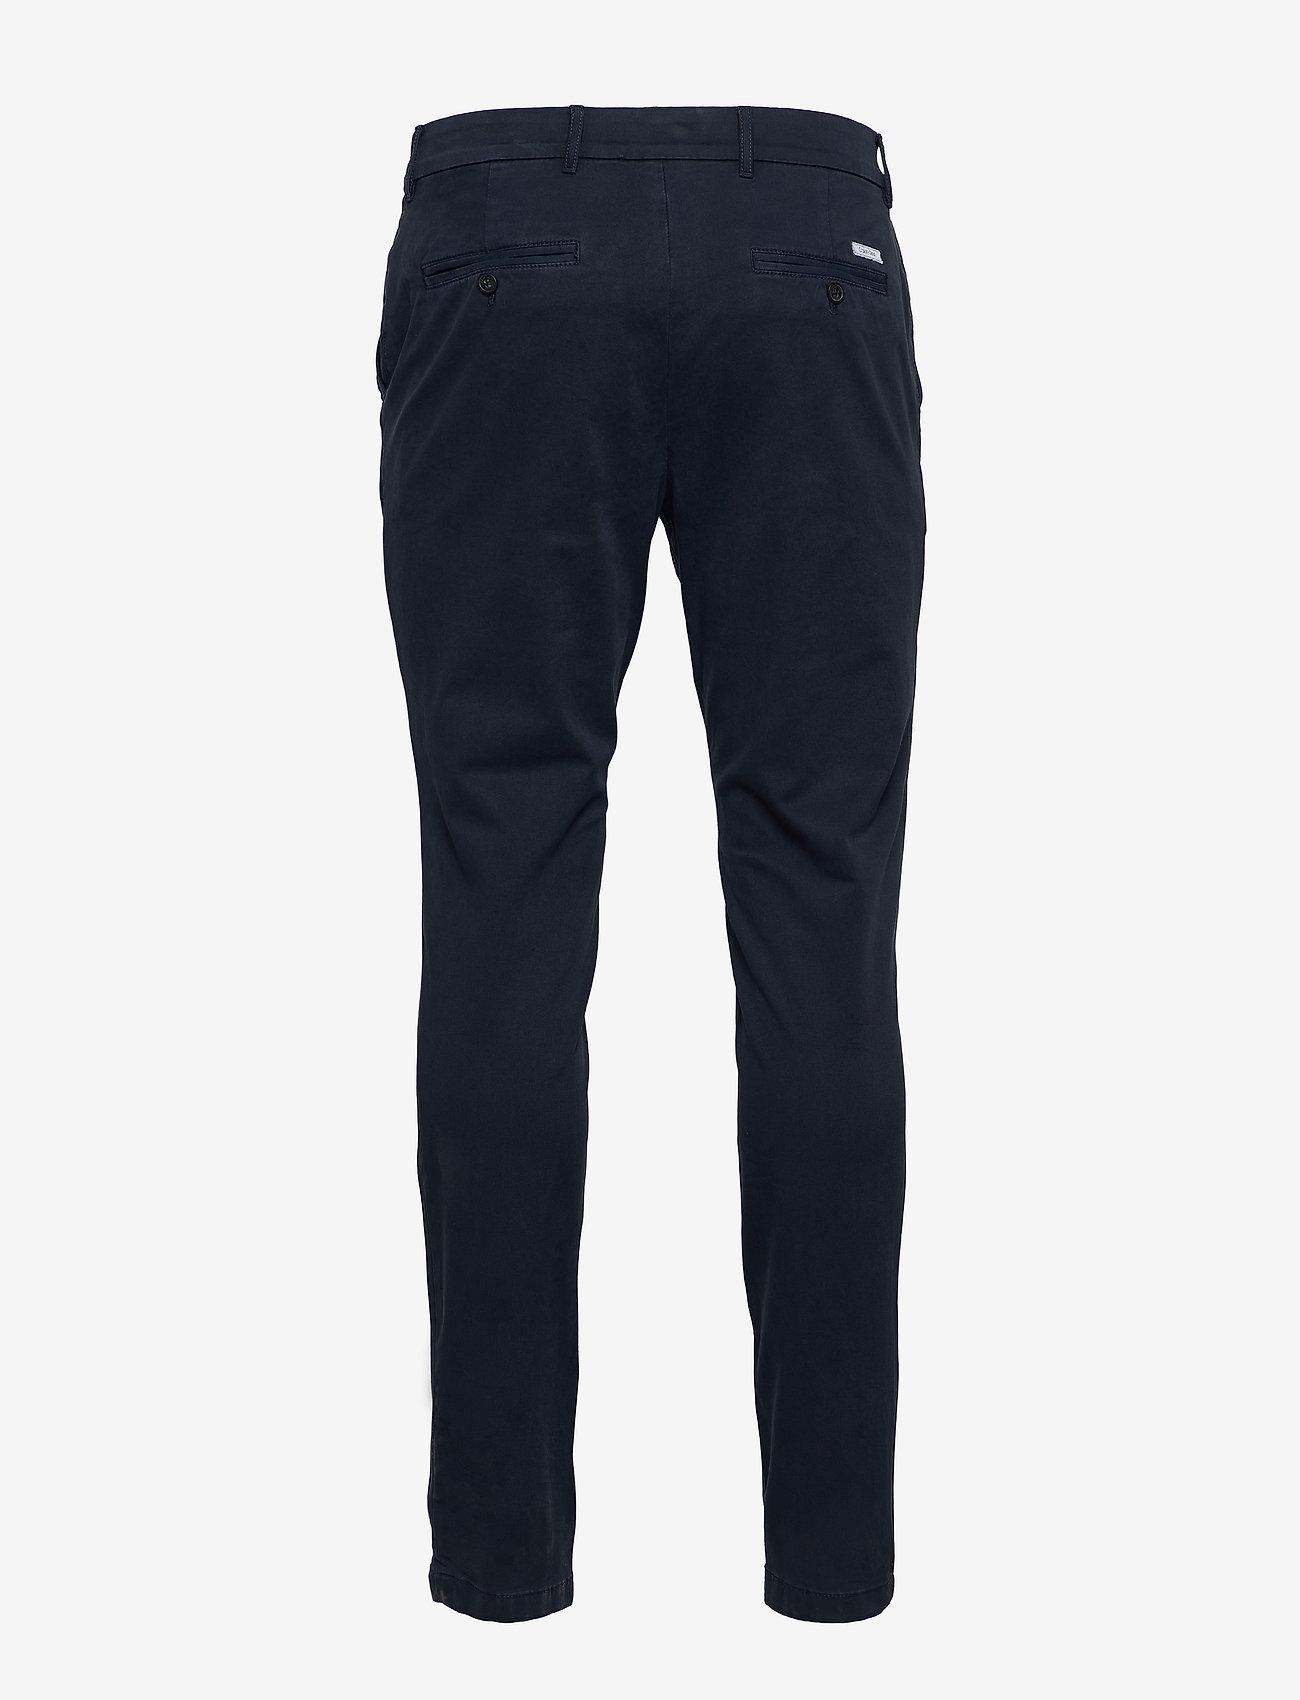 Slim Fit Garment Dye Chino (Calvin Navy) - Calvin Klein i1T4df